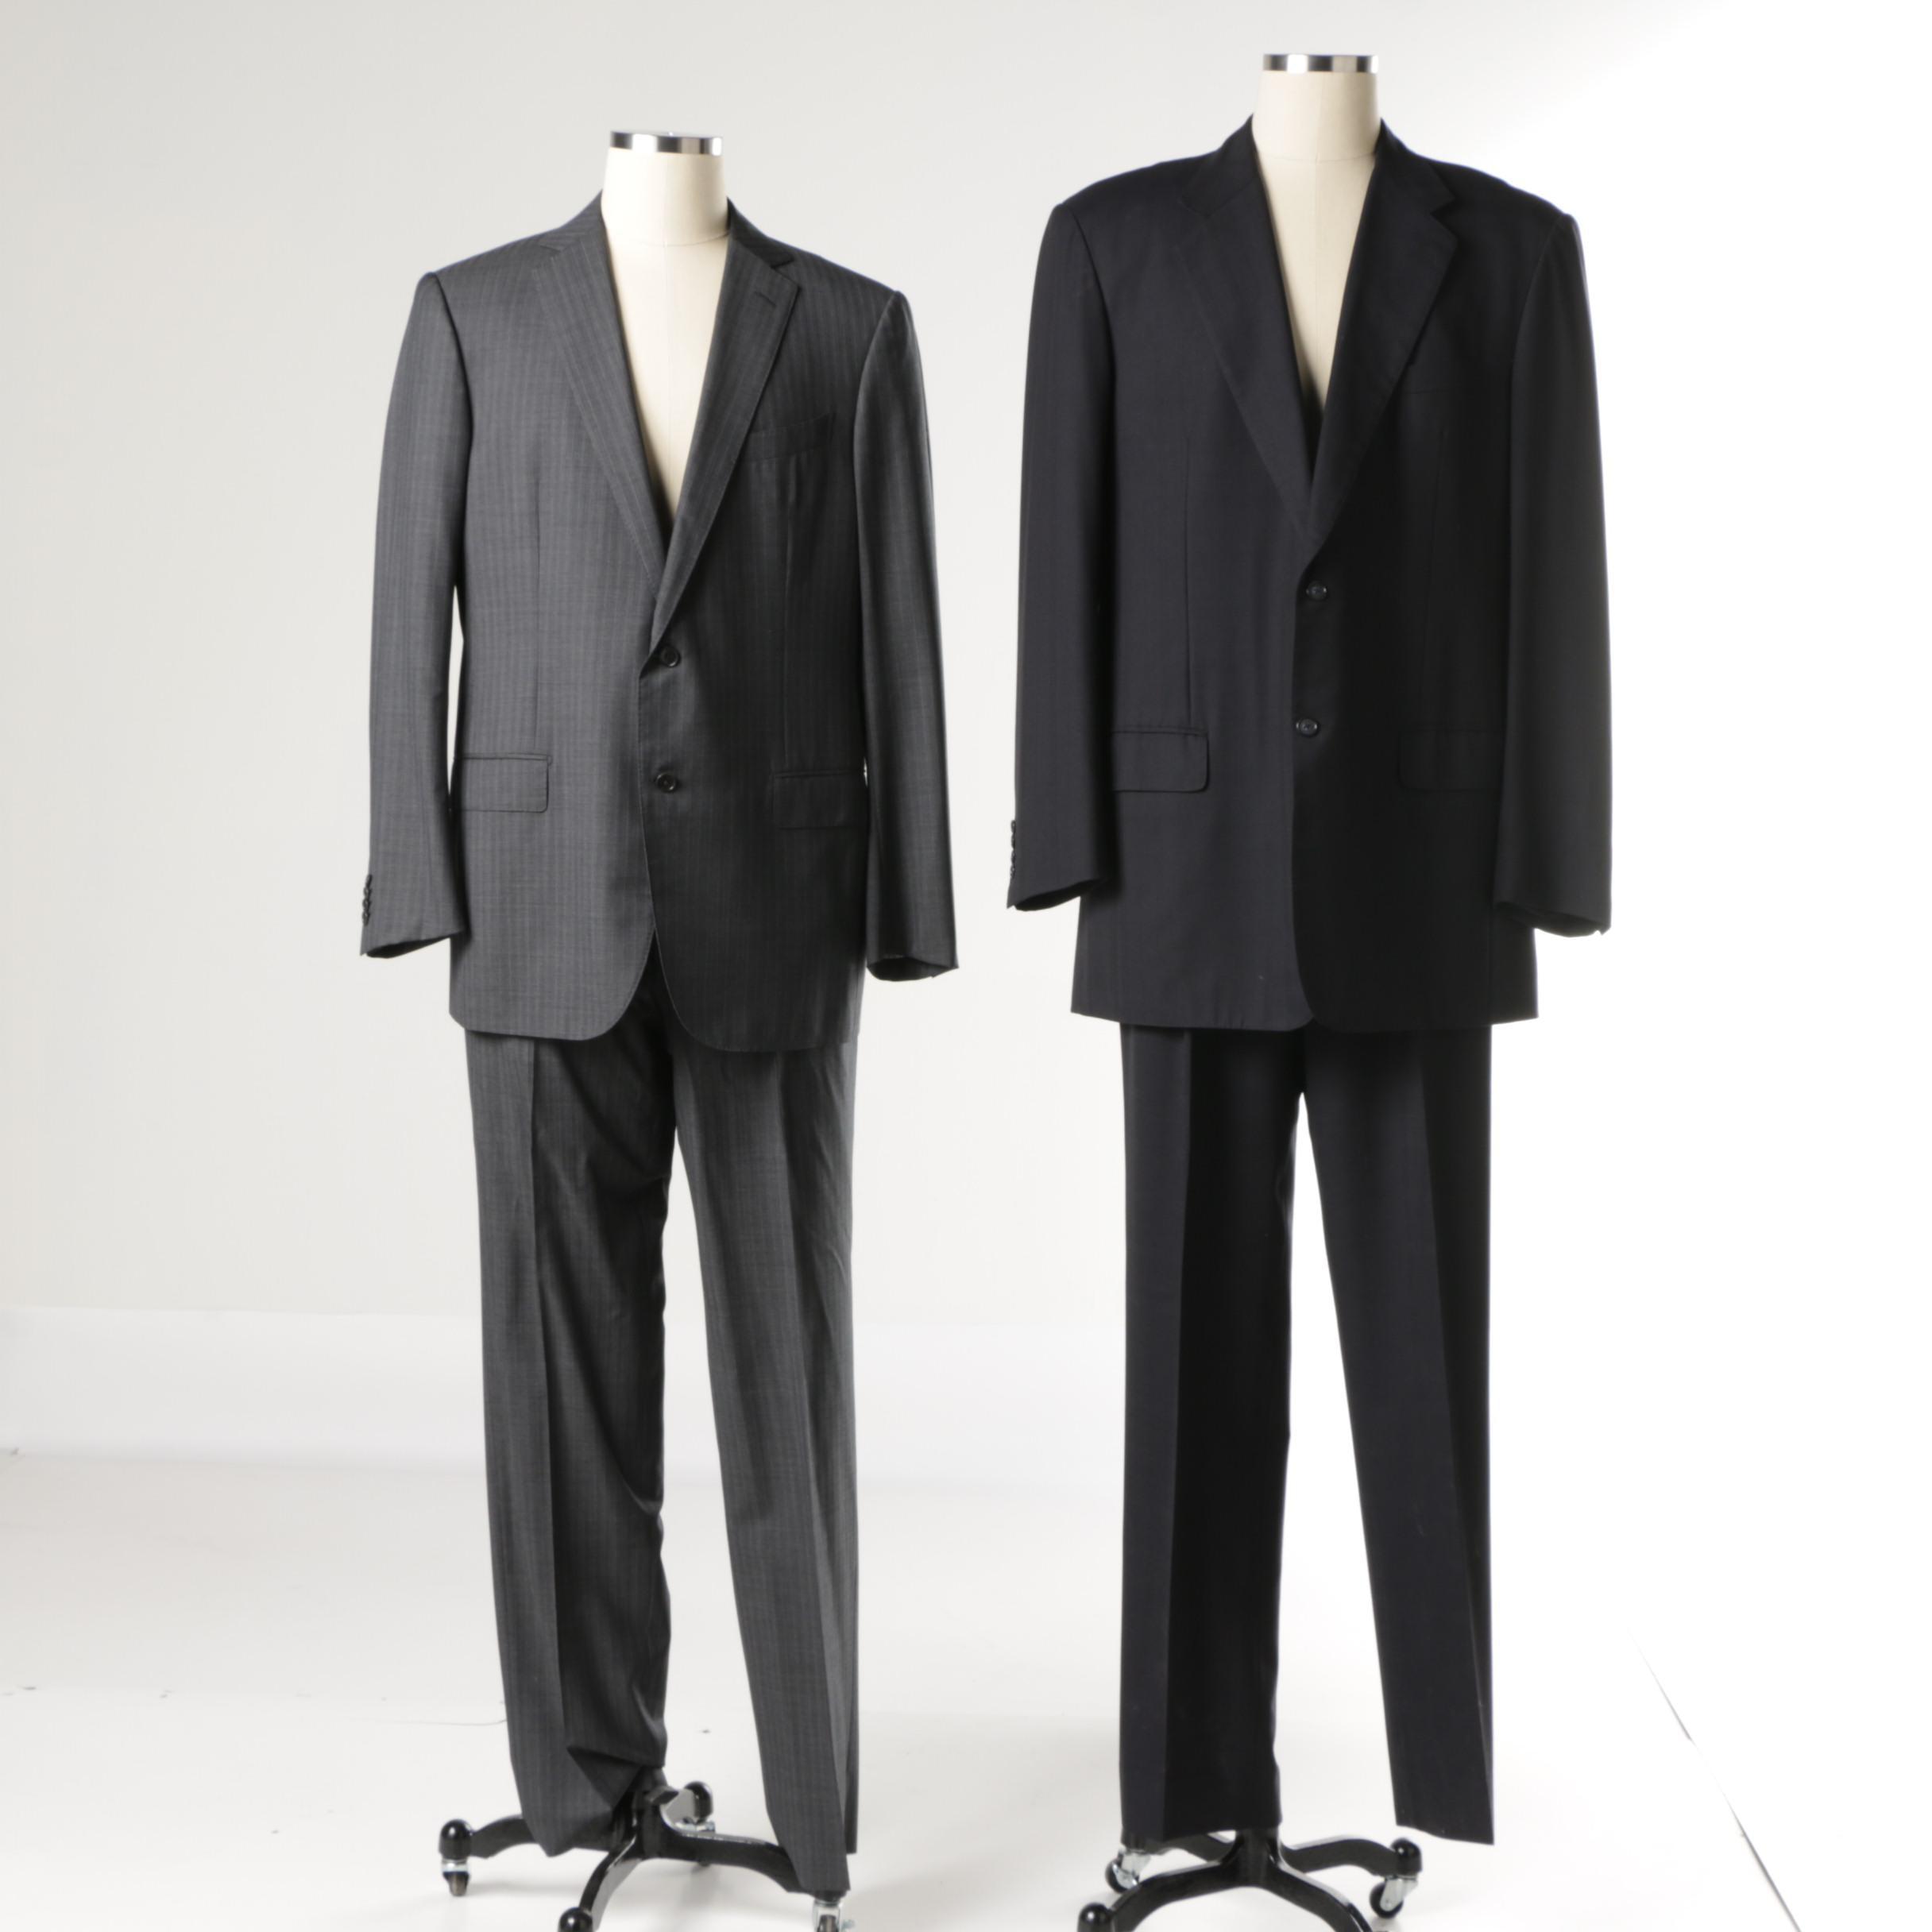 Men's Ermenegildo Zegna and B. Clemo Exclusive Tailor Ltd Suits